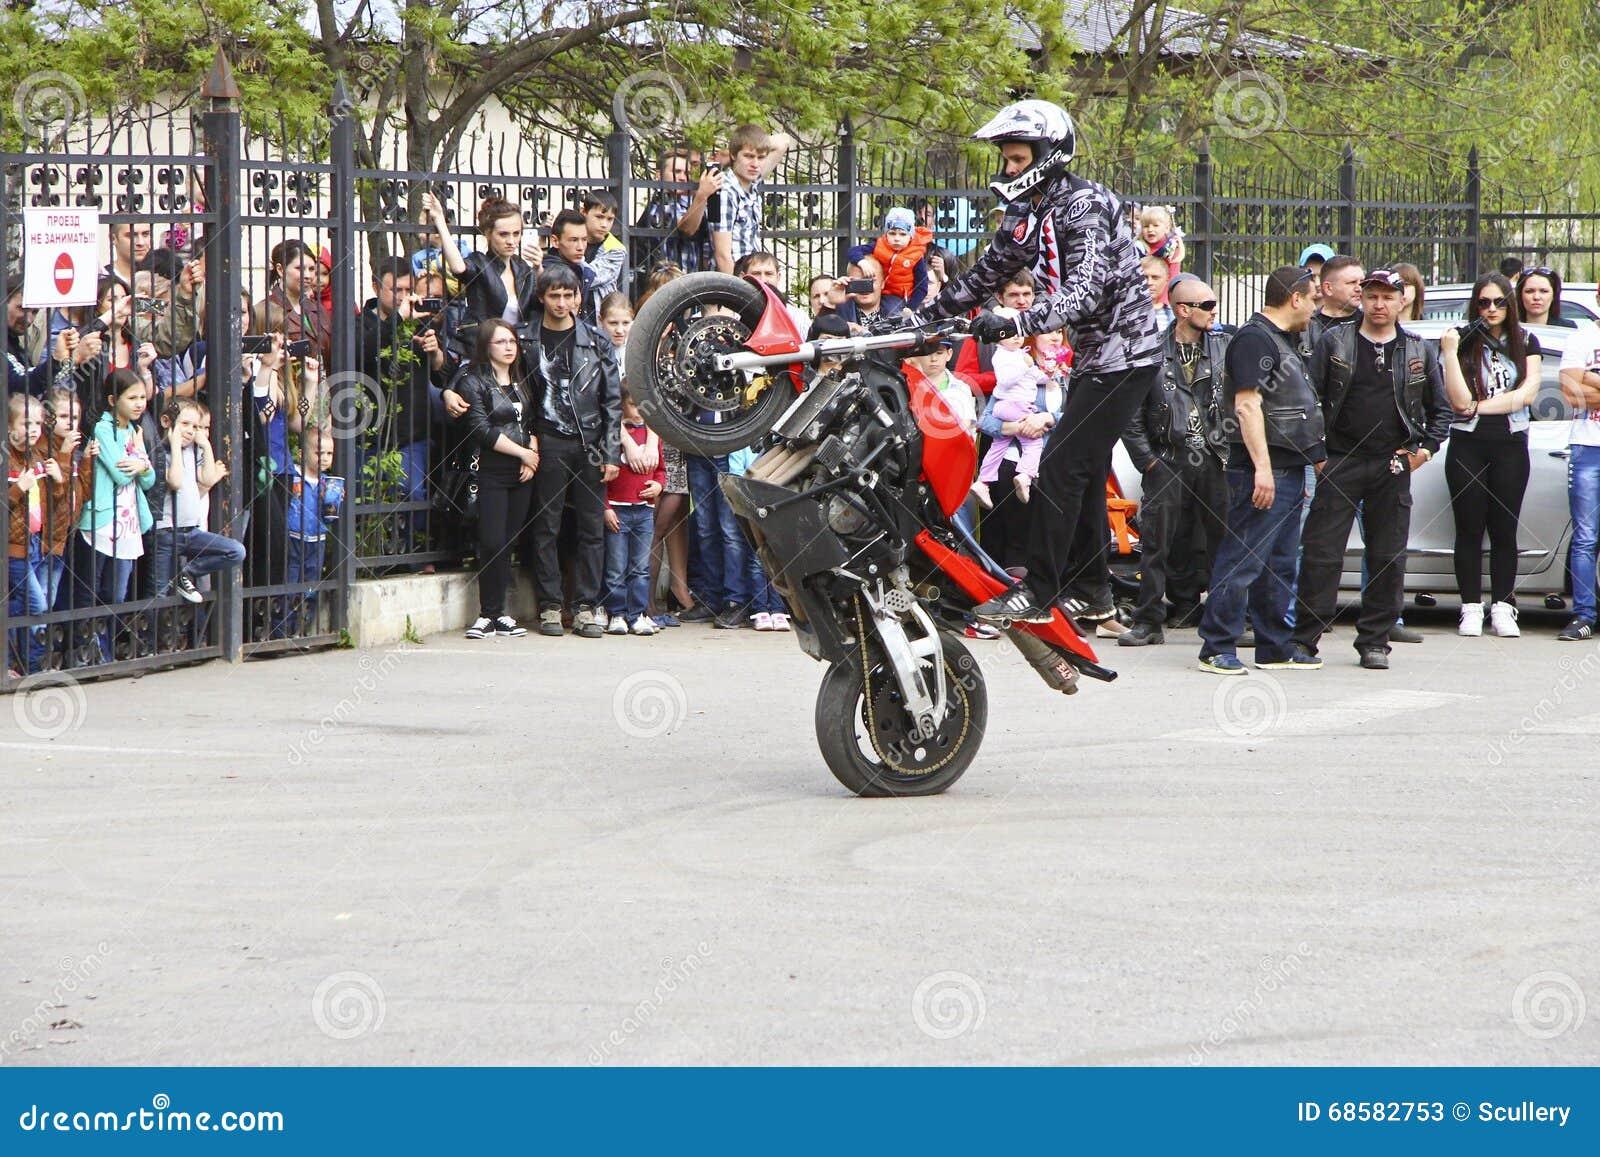 Motofree moto free style pilot stunting on the square editorial stock photo